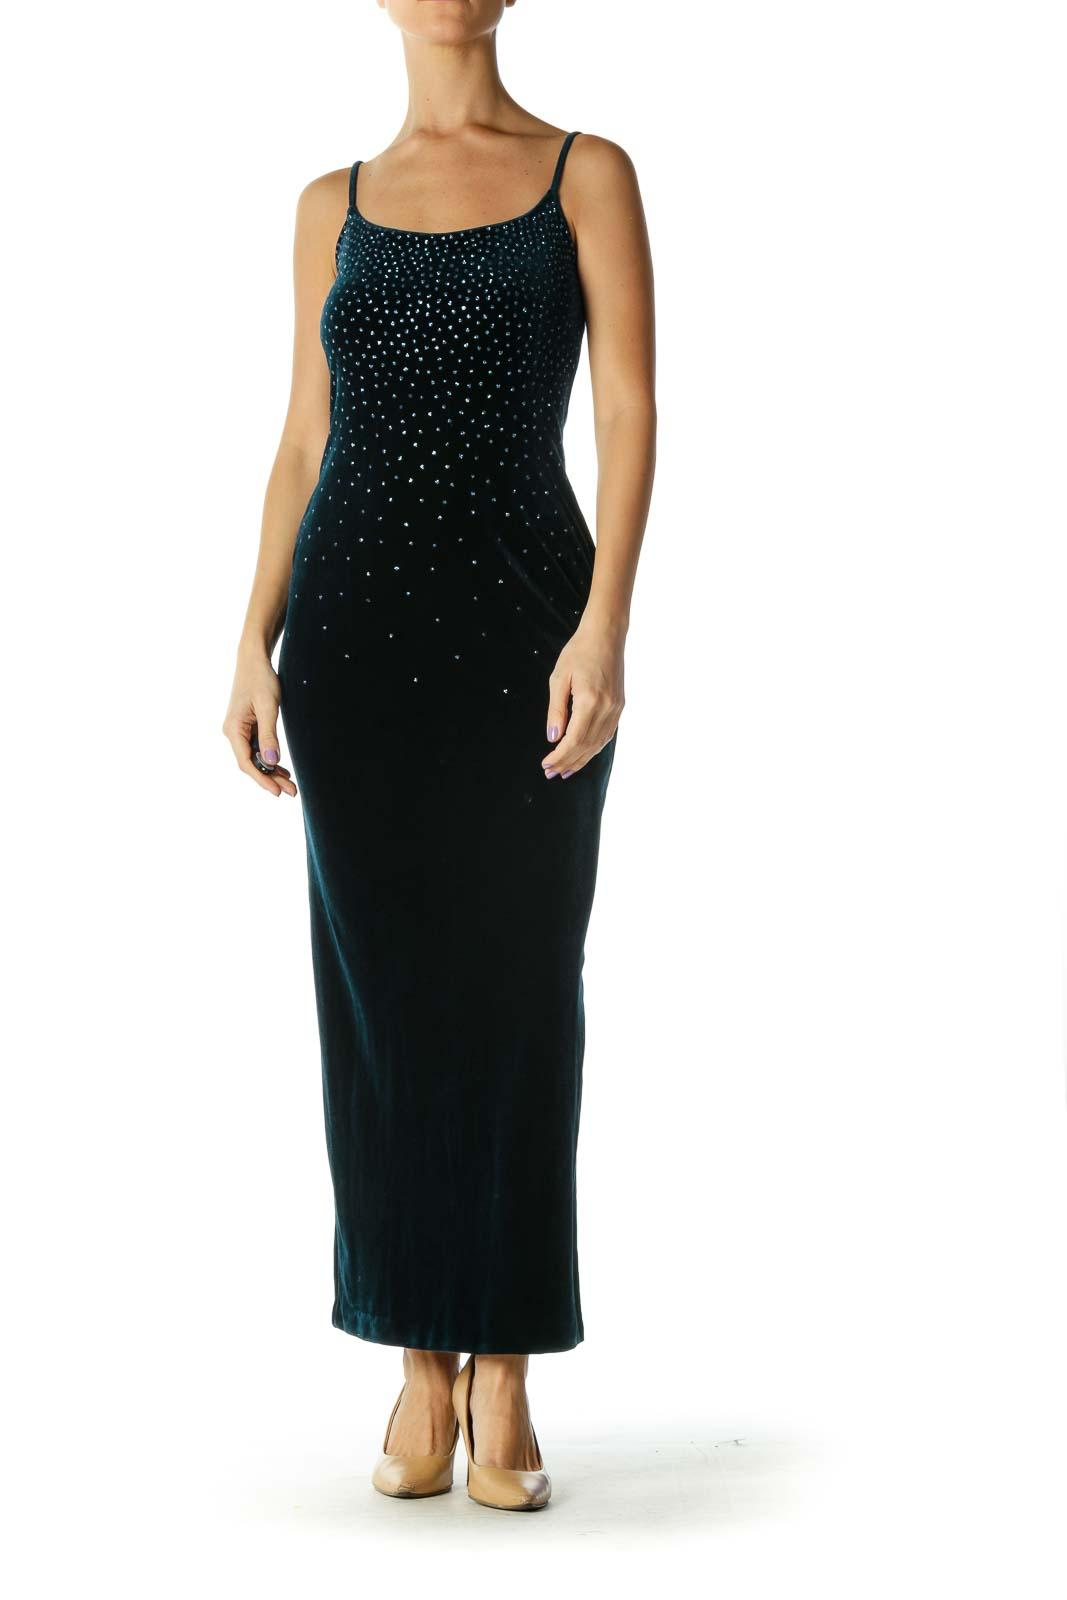 Black Sequin Chic Column Dress Front